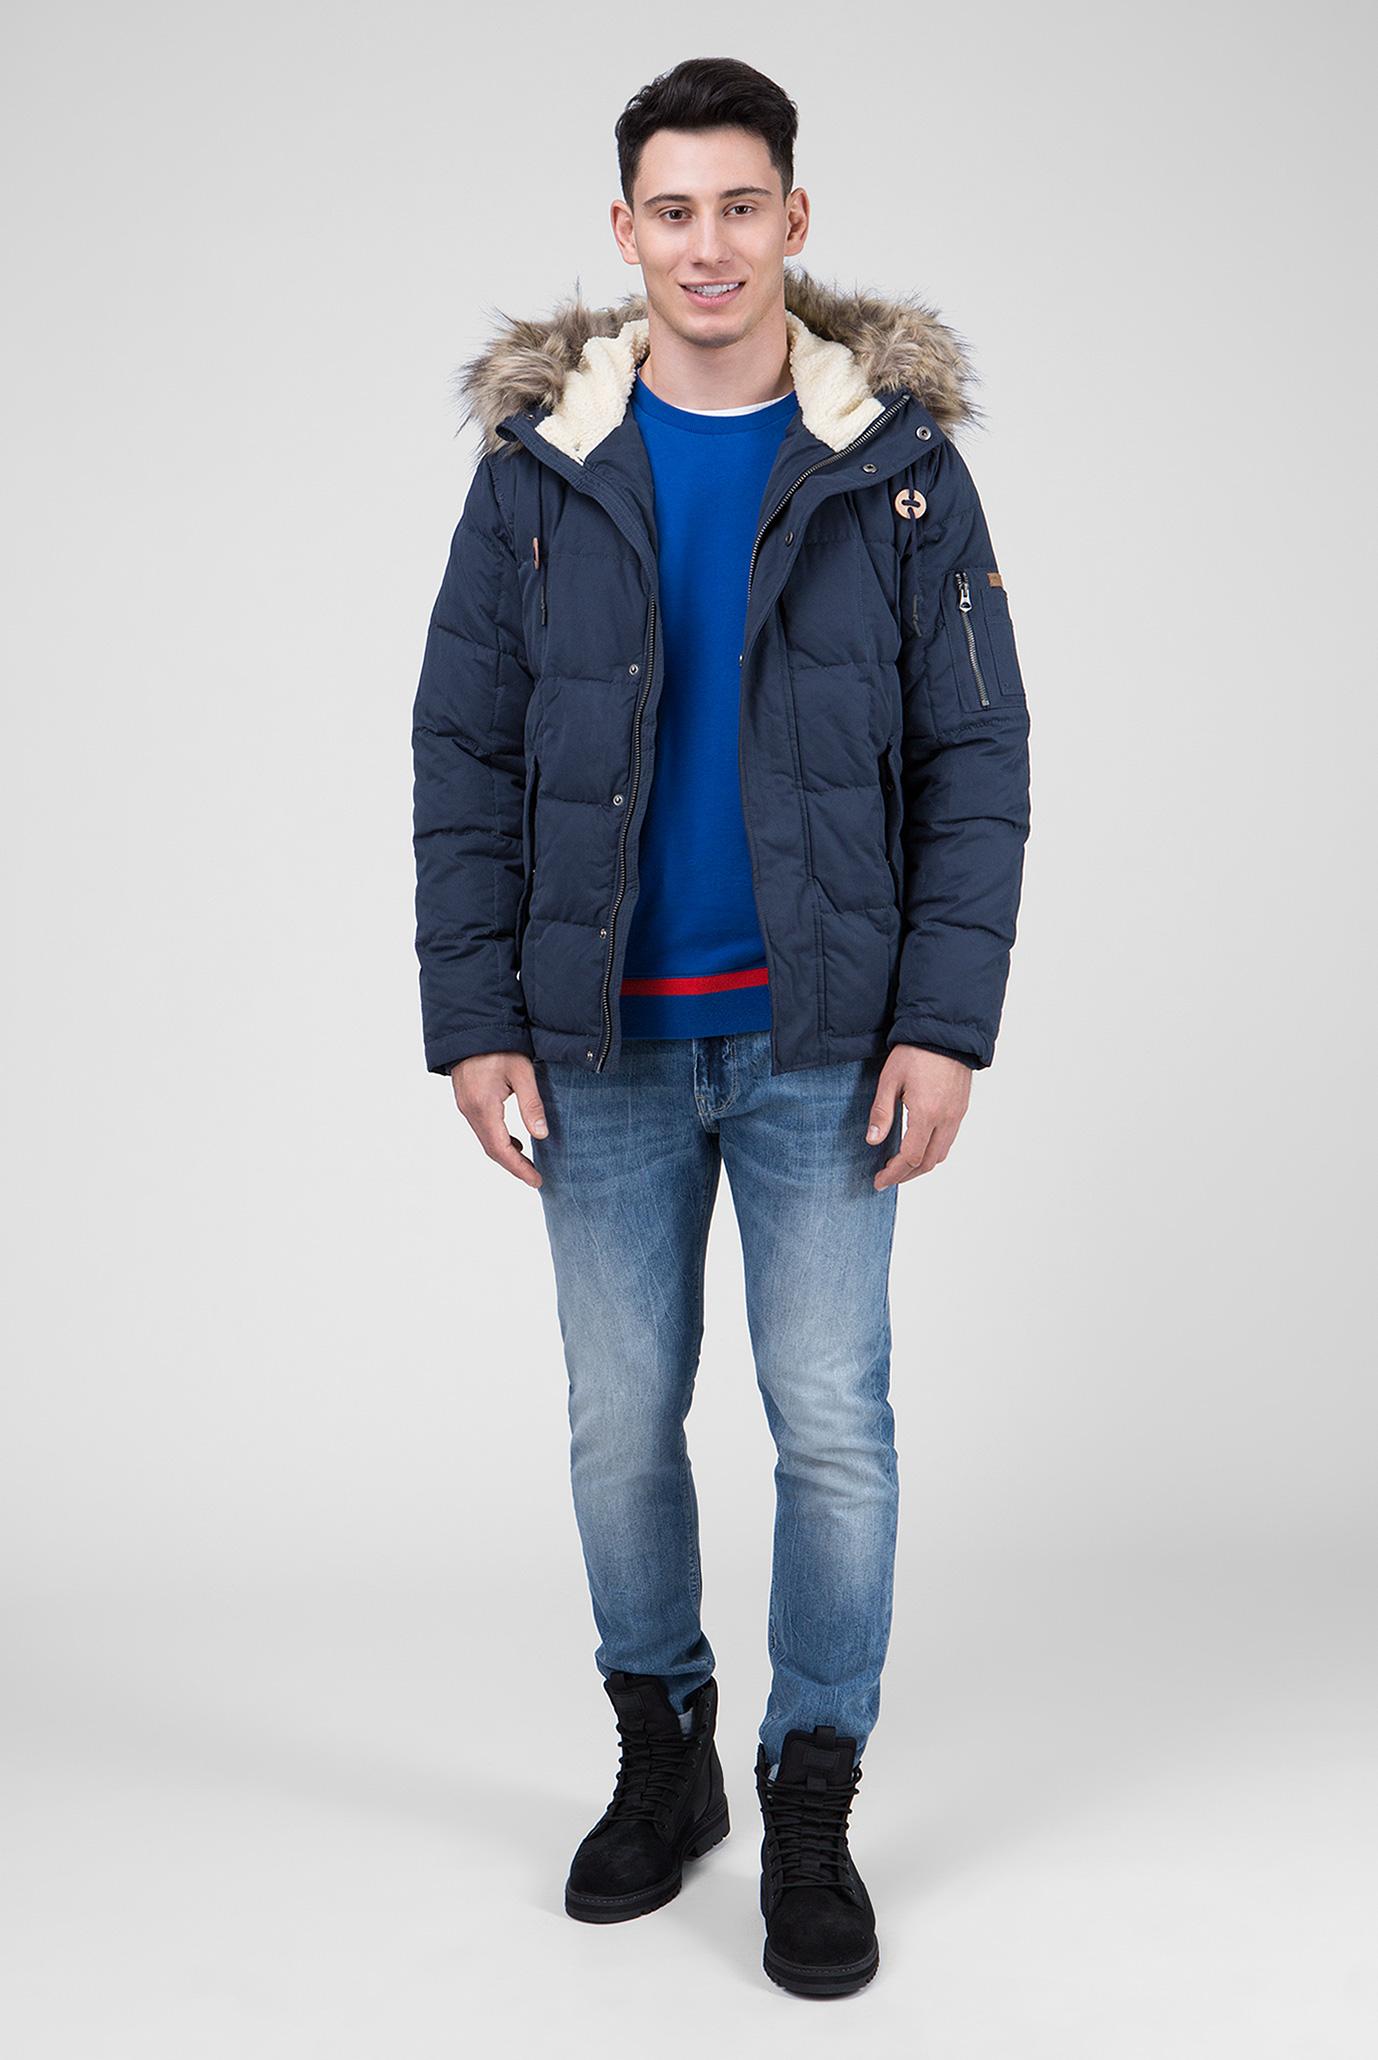 Купить Мужской синий пуховик DRURY Pepe Jeans Pepe Jeans PM401895 – Киев, Украина. Цены в интернет магазине MD Fashion